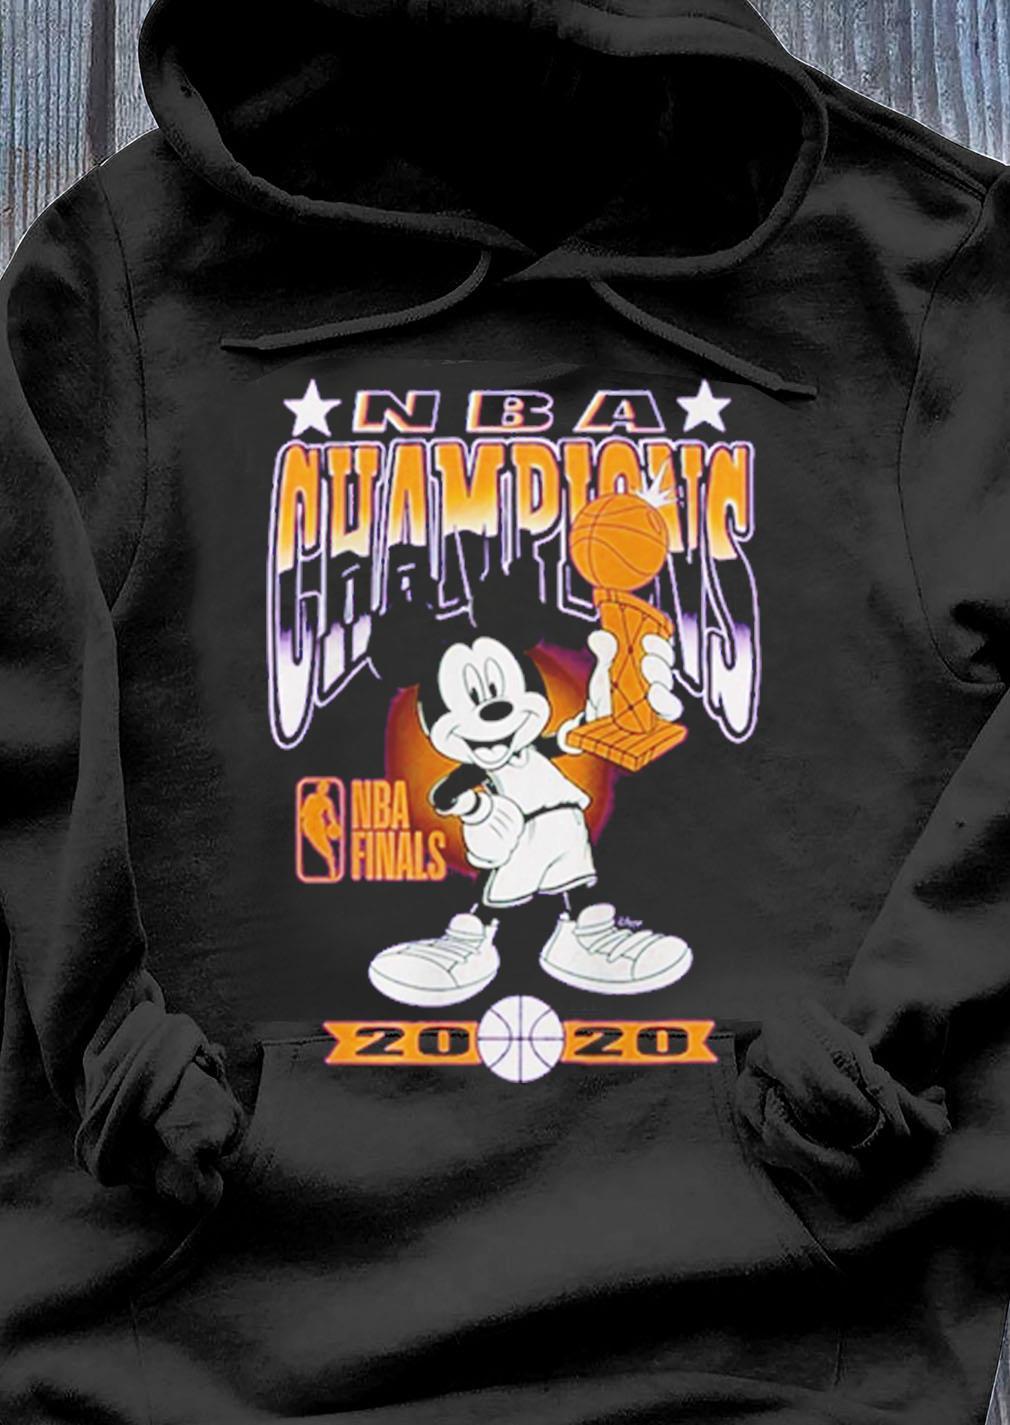 Los Angeles Lakers Junk Food 2020 Nba Finals Champions Mickey Trophy Shirt Hoodie